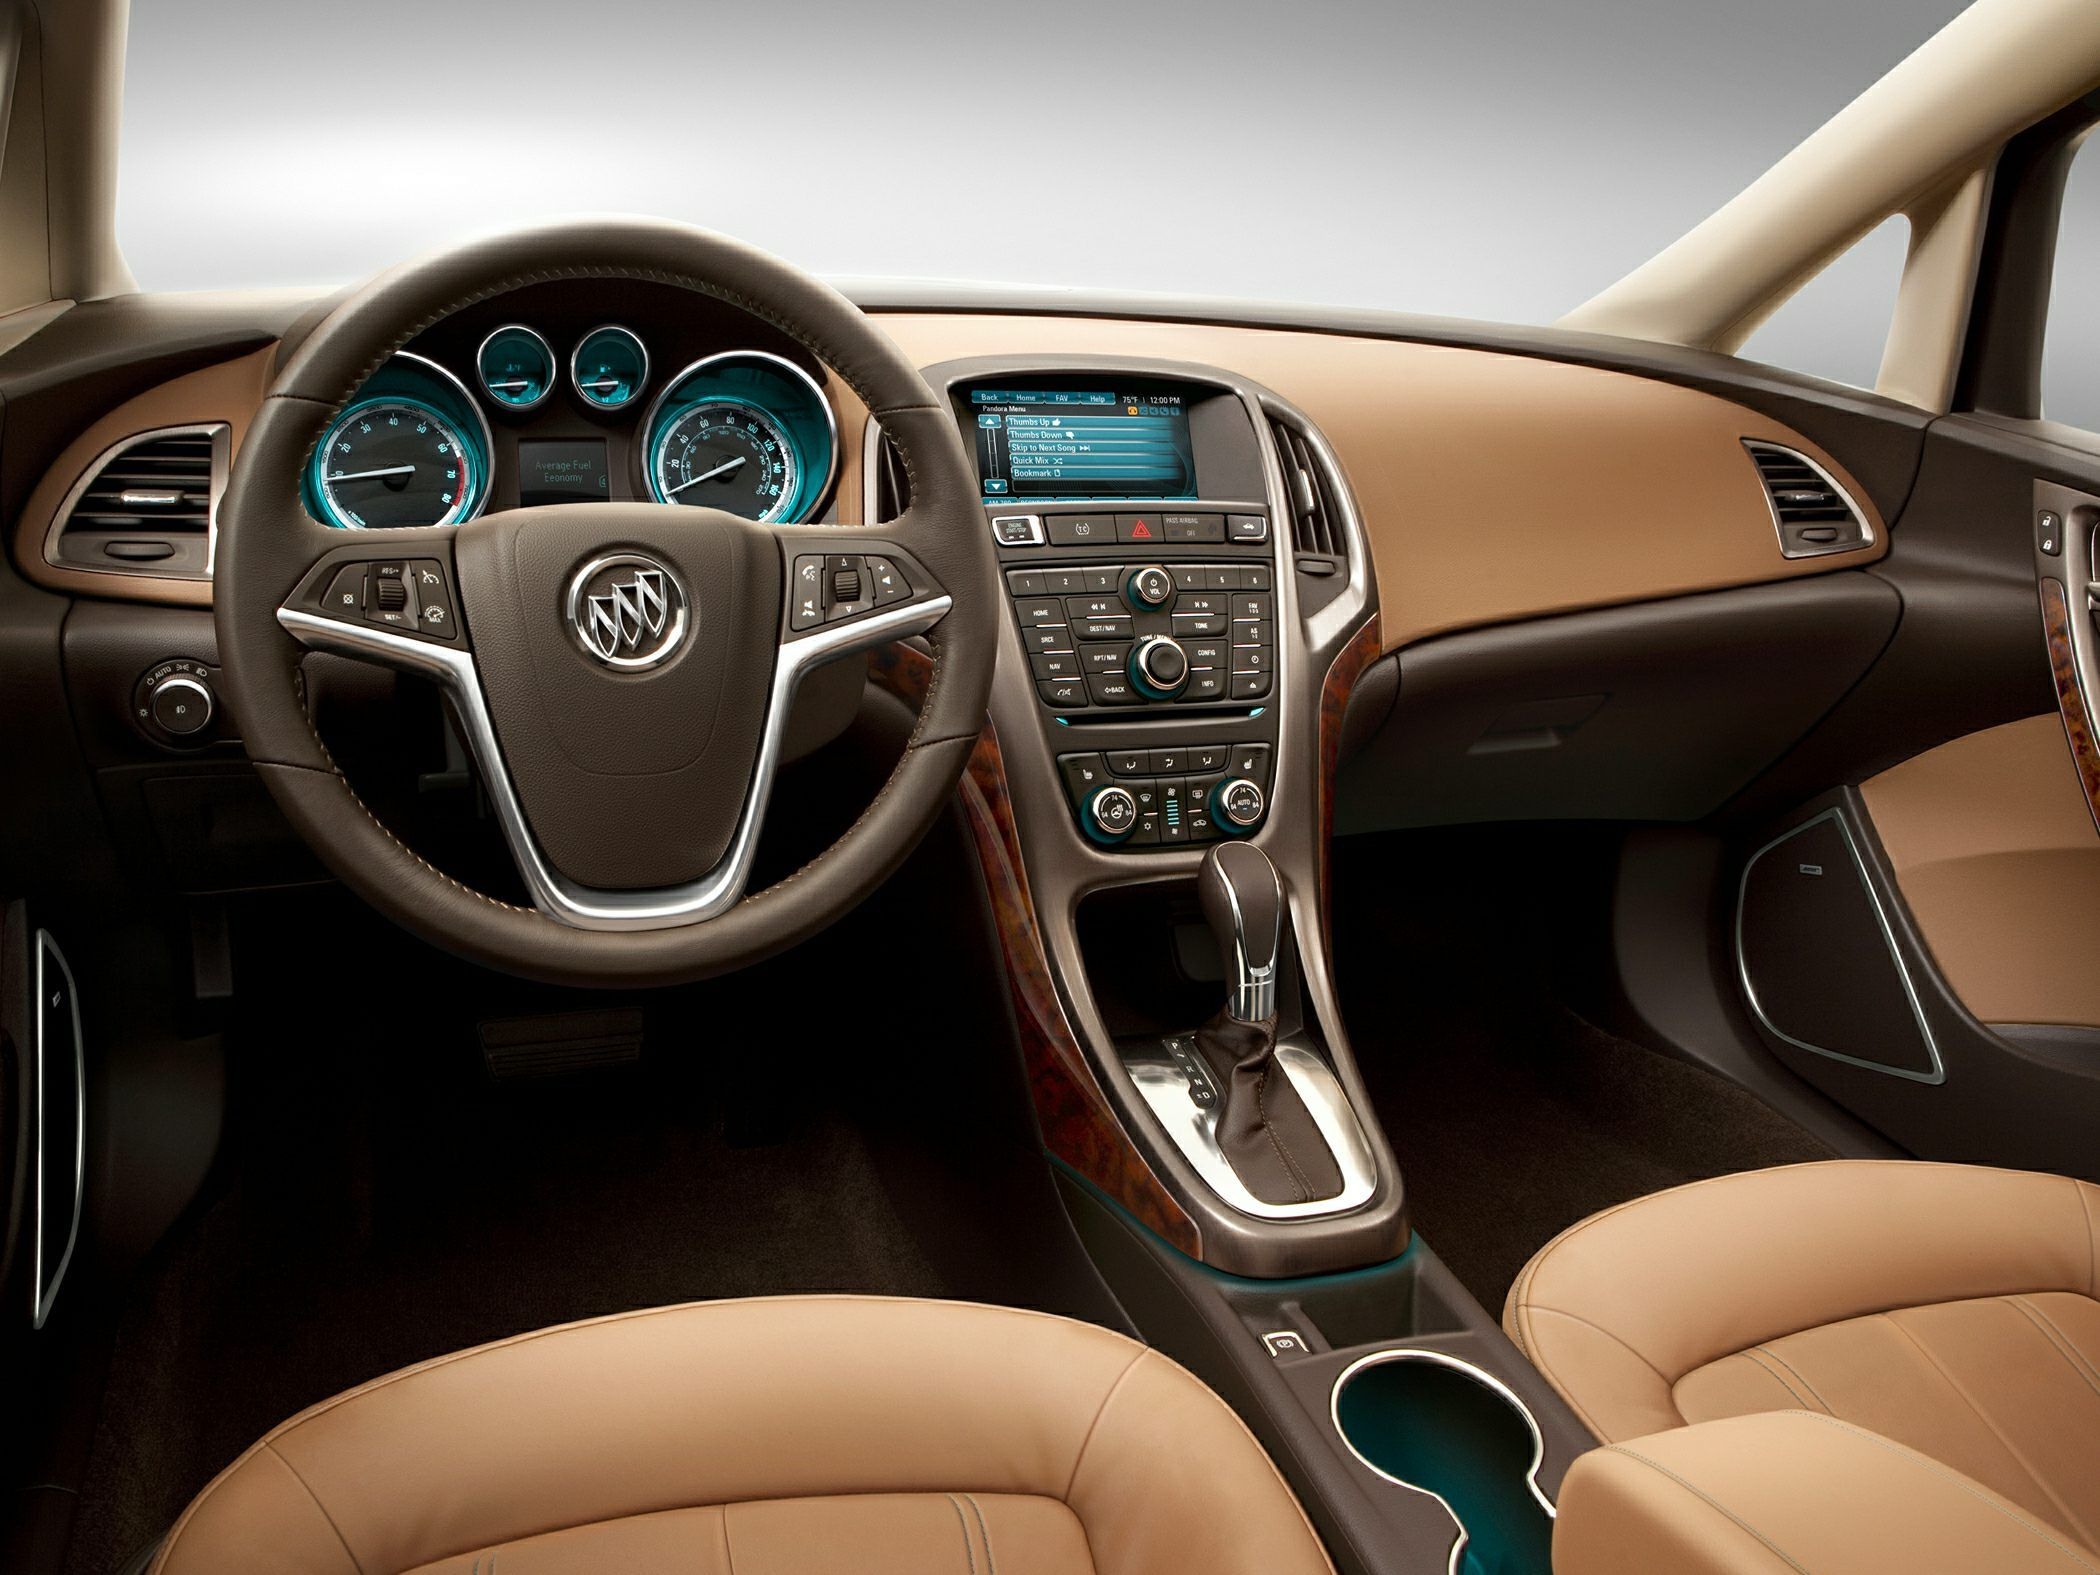 Buick Model Interiors New 2014 Buick Verano Price Photos Reviews Features Buick Verano Buick Buick Grand National